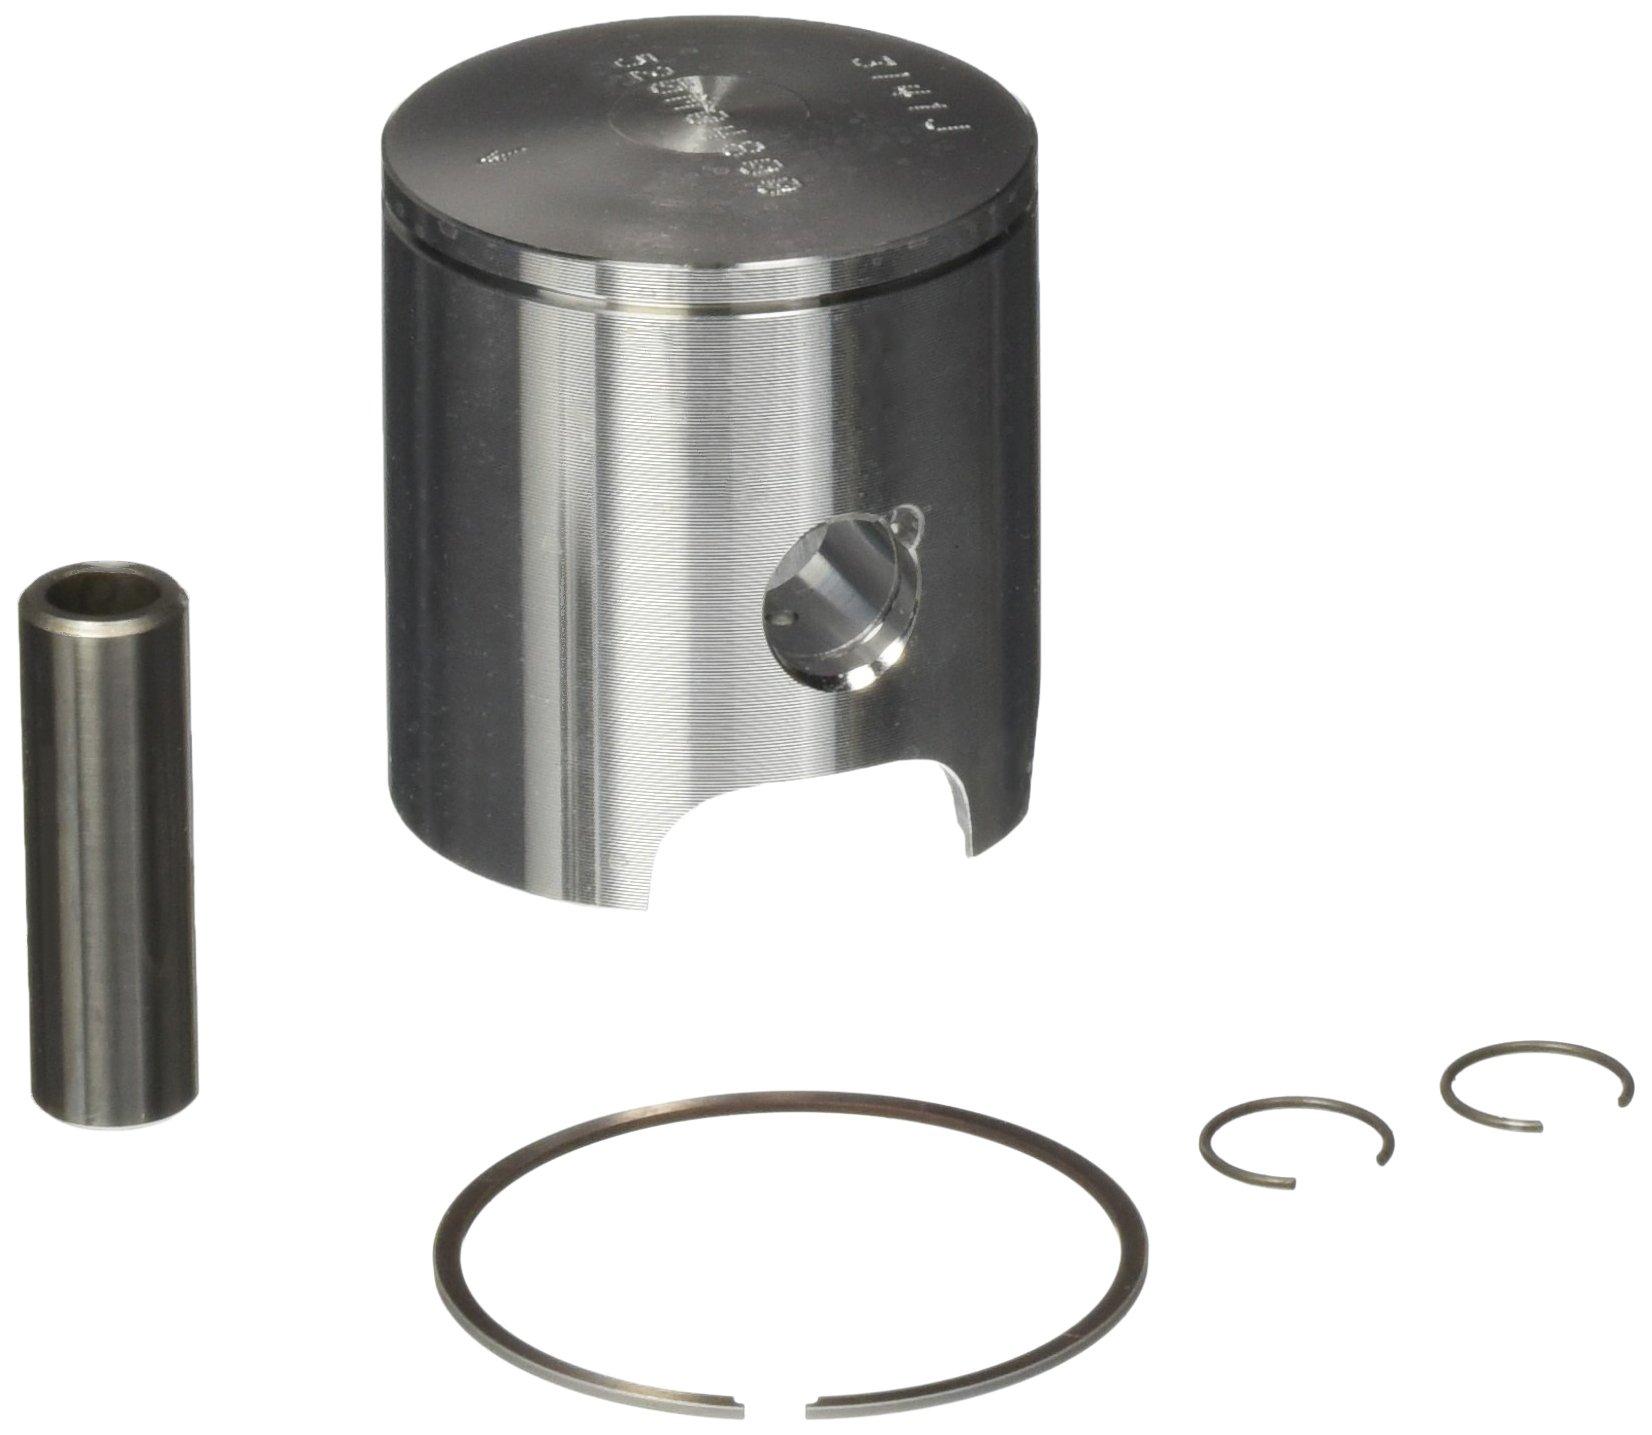 Wiseco 520M04800 48.00 mm 2-Stroke Off-Road Piston